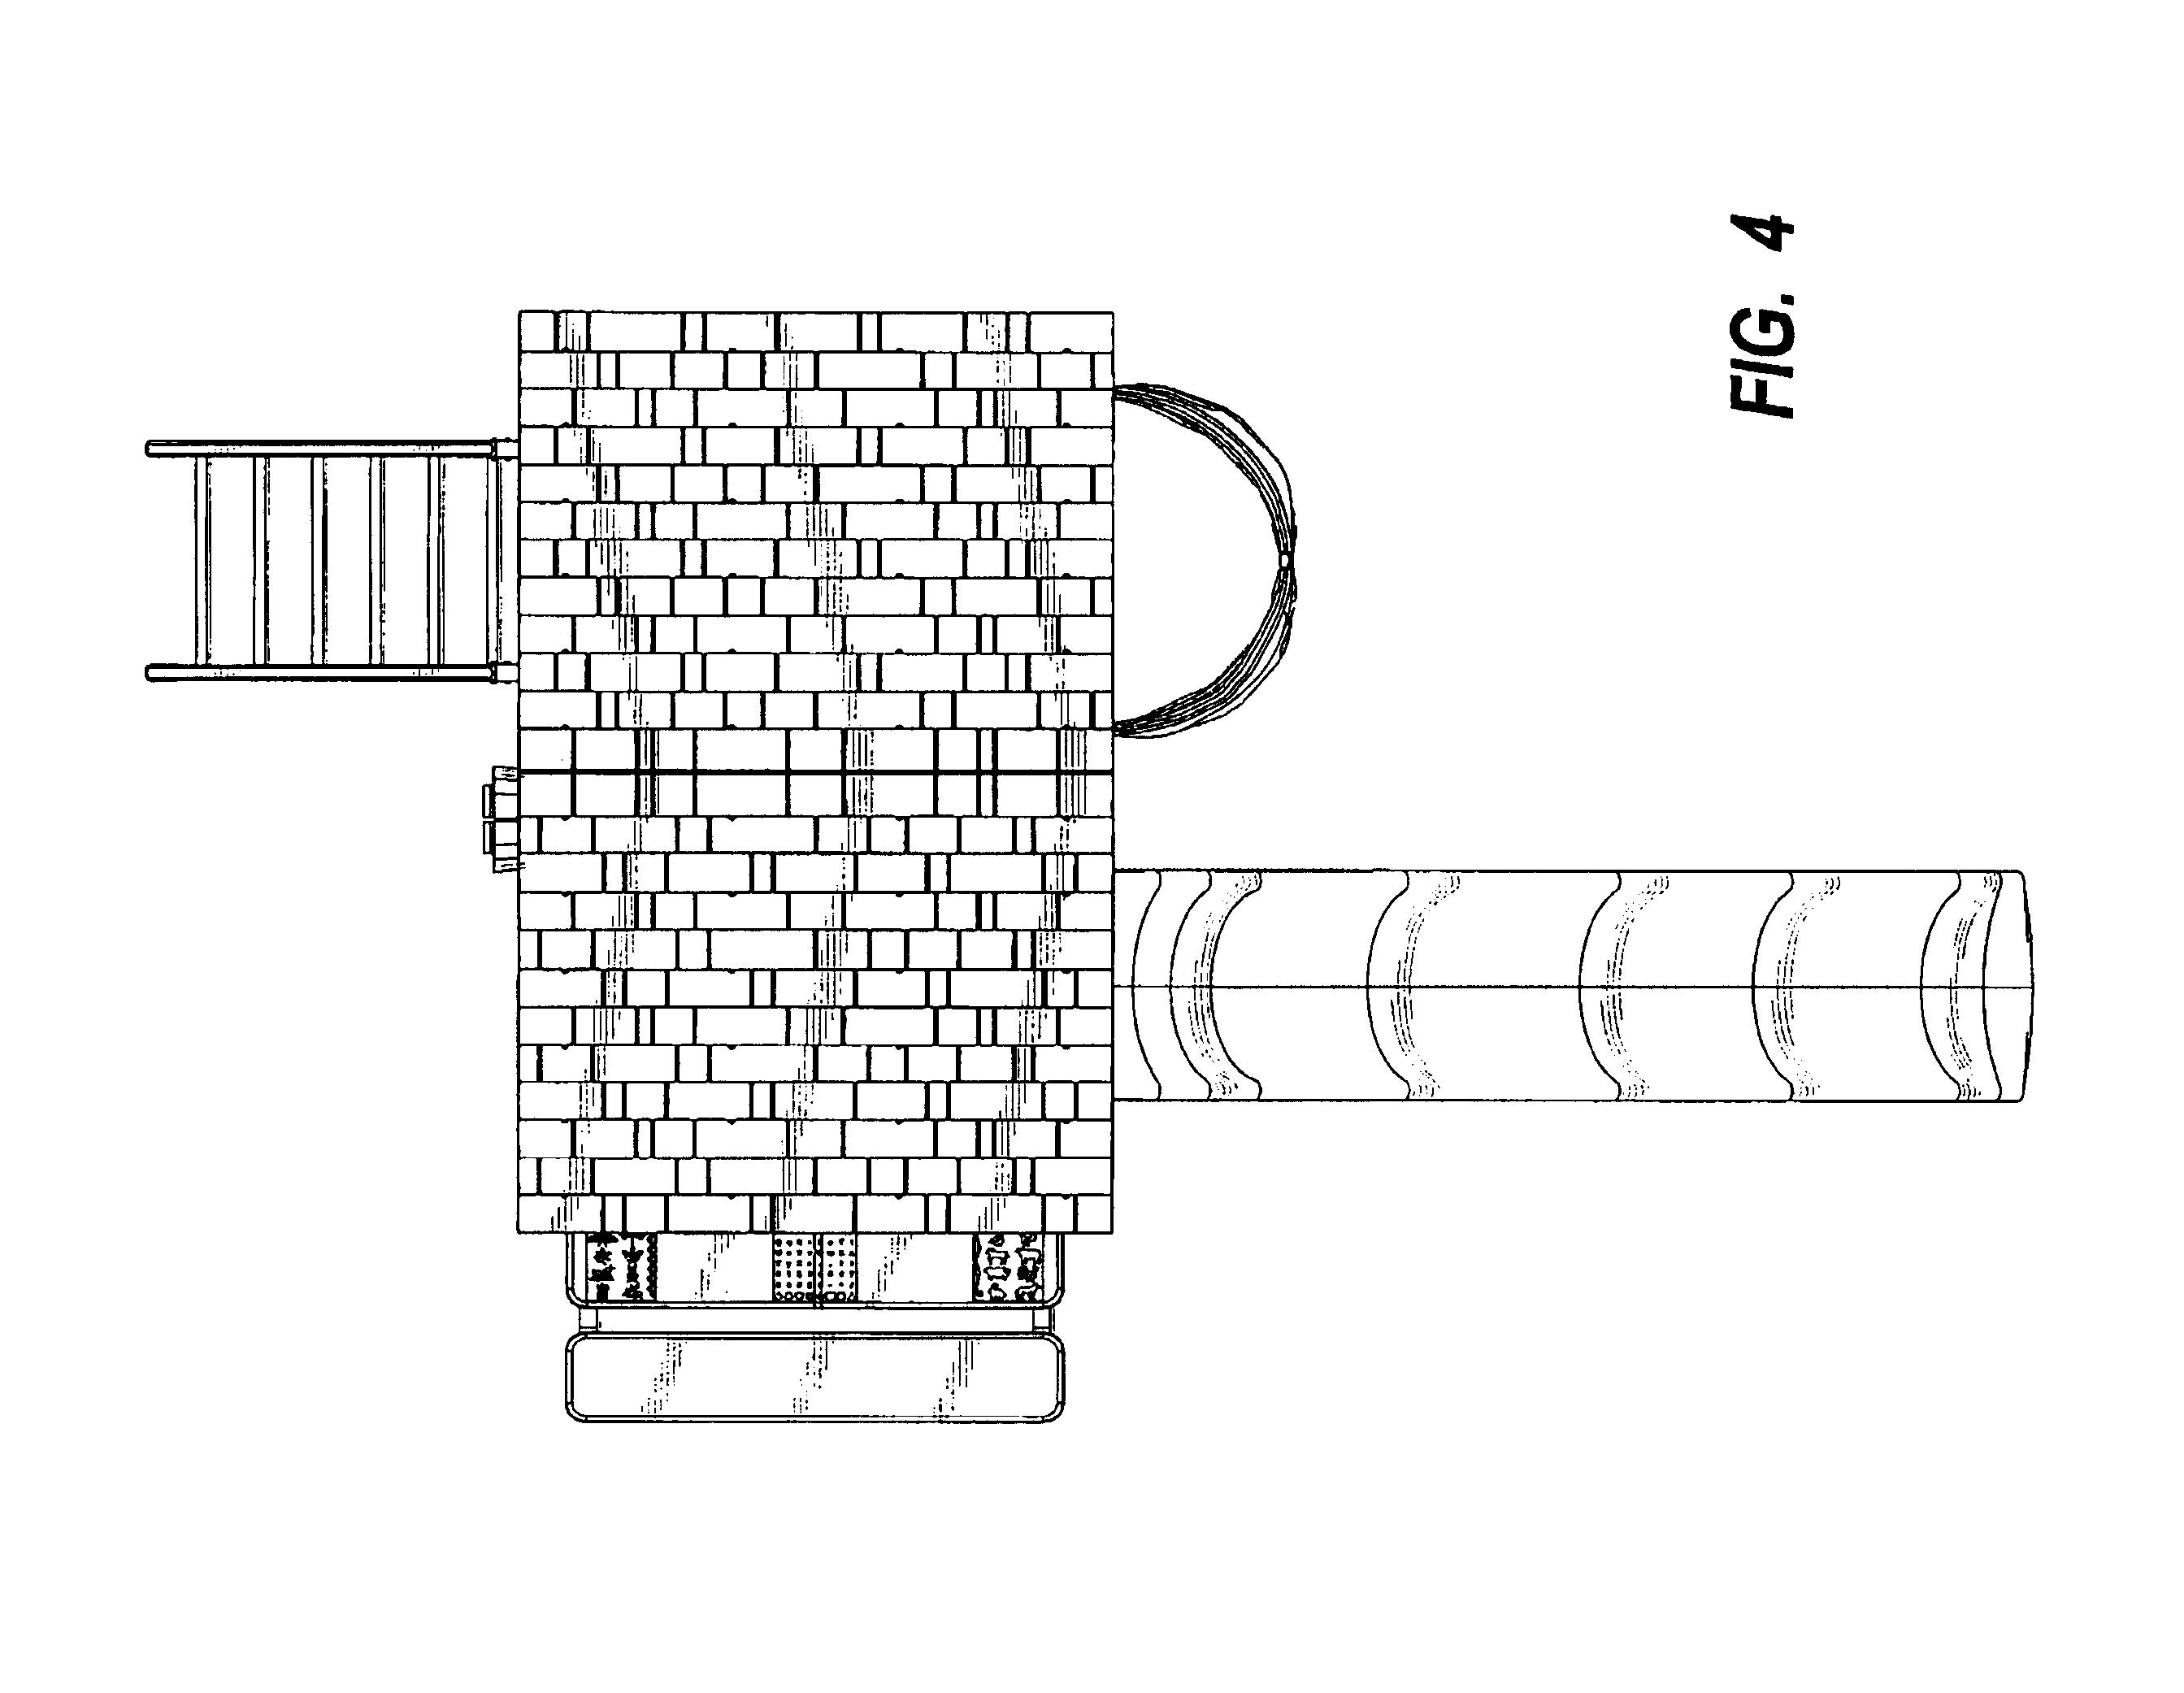 patent usd536407 playground equipment google patents